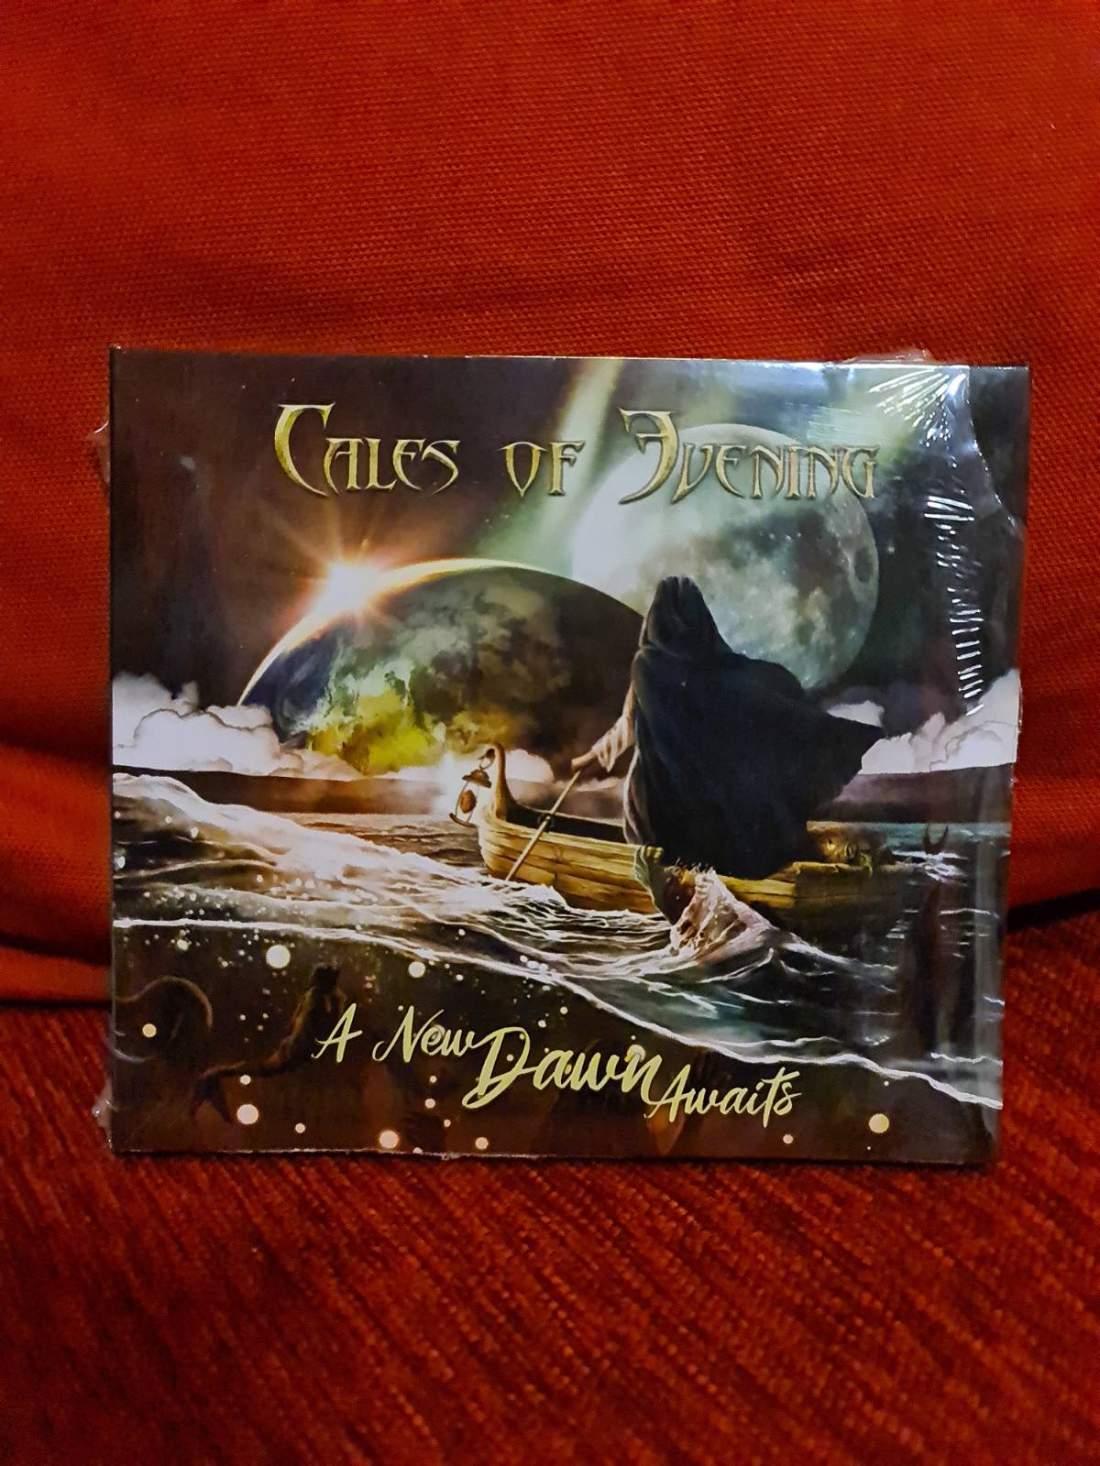 TALES OF EVENING - NEW DAWN AWAITS CD